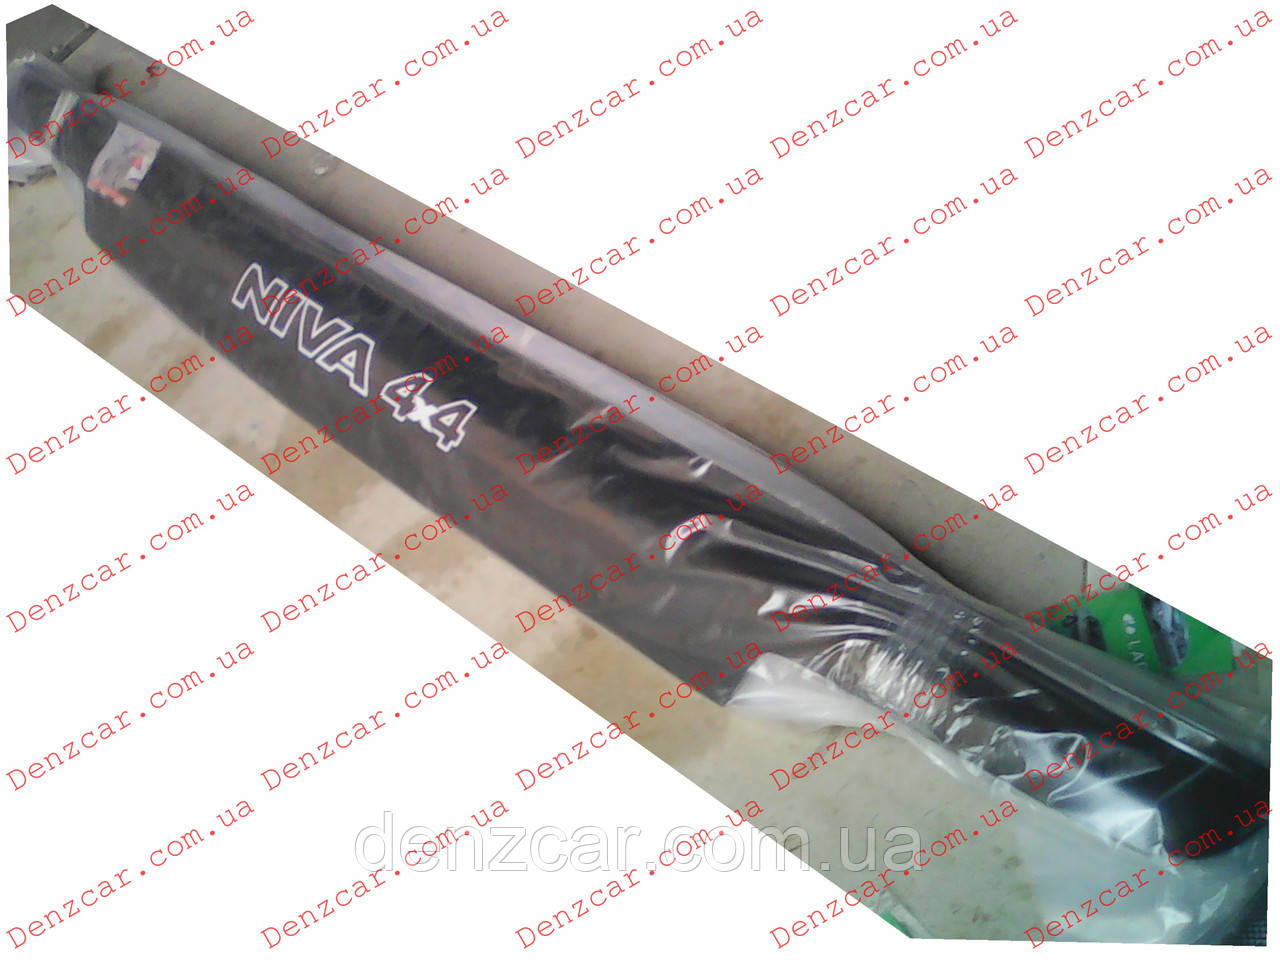 Дефлектор капота CHEVROLET Niva 2002, фото 1